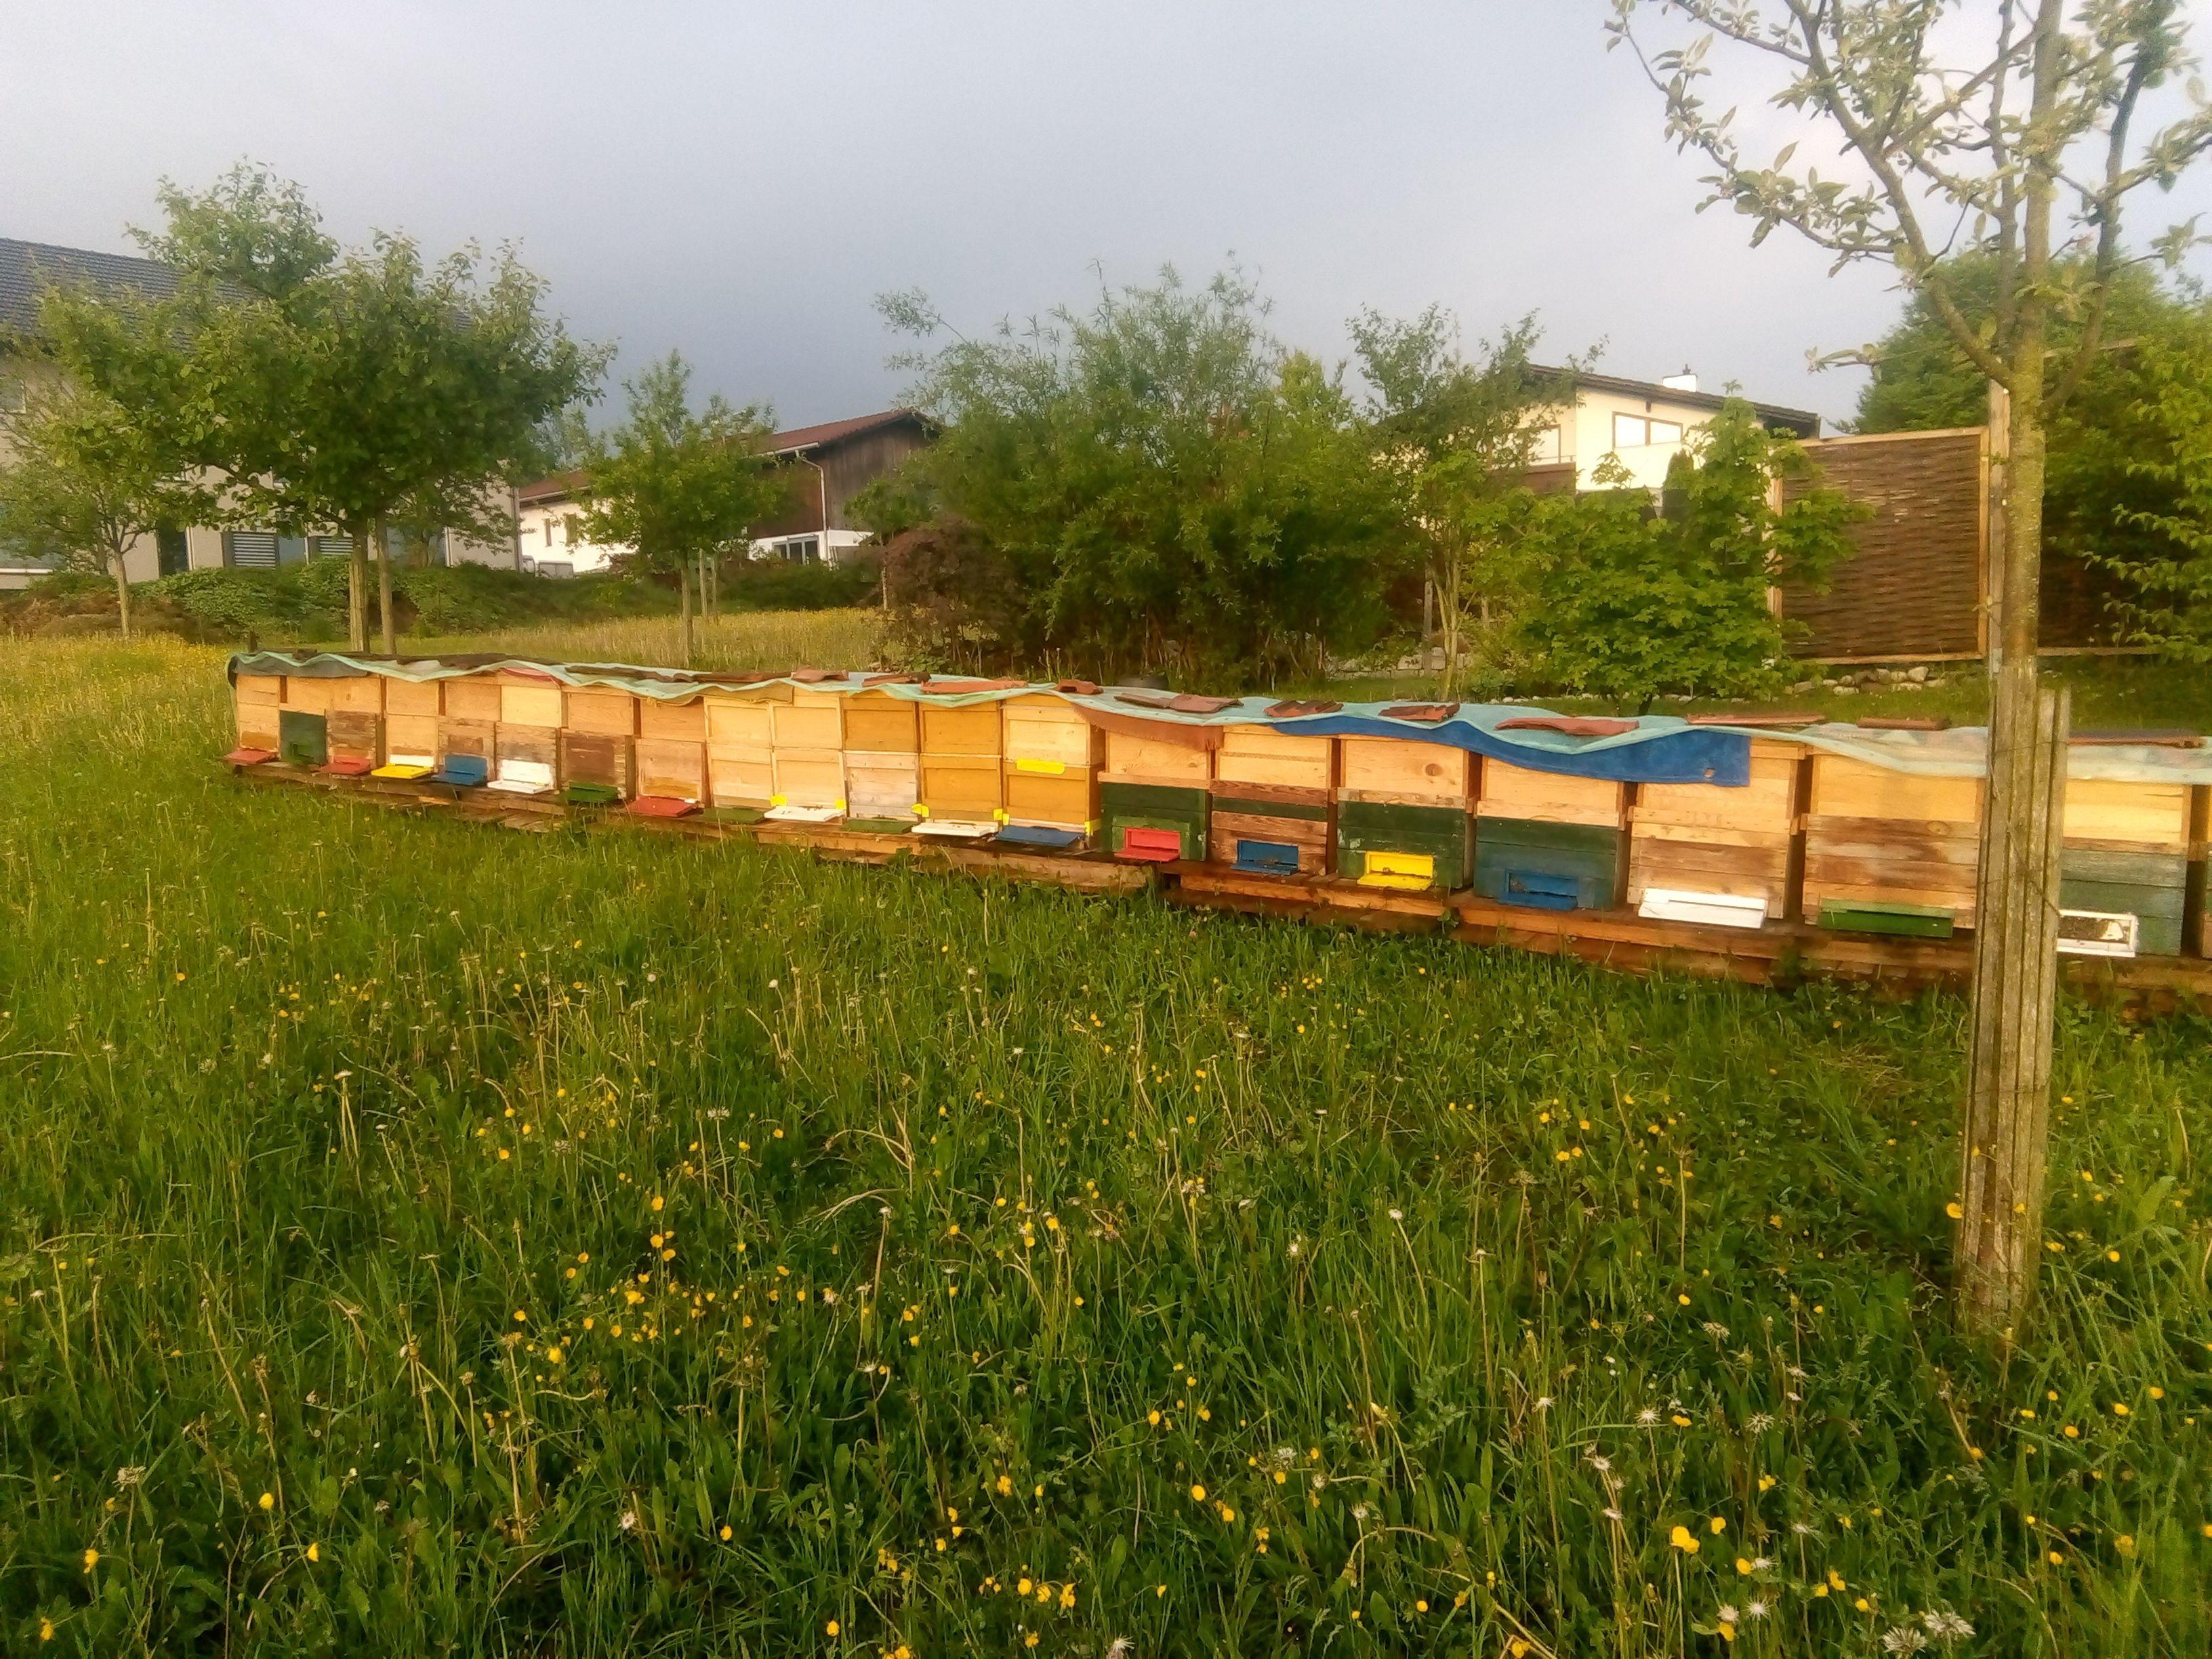 Faszination Bienenvolk